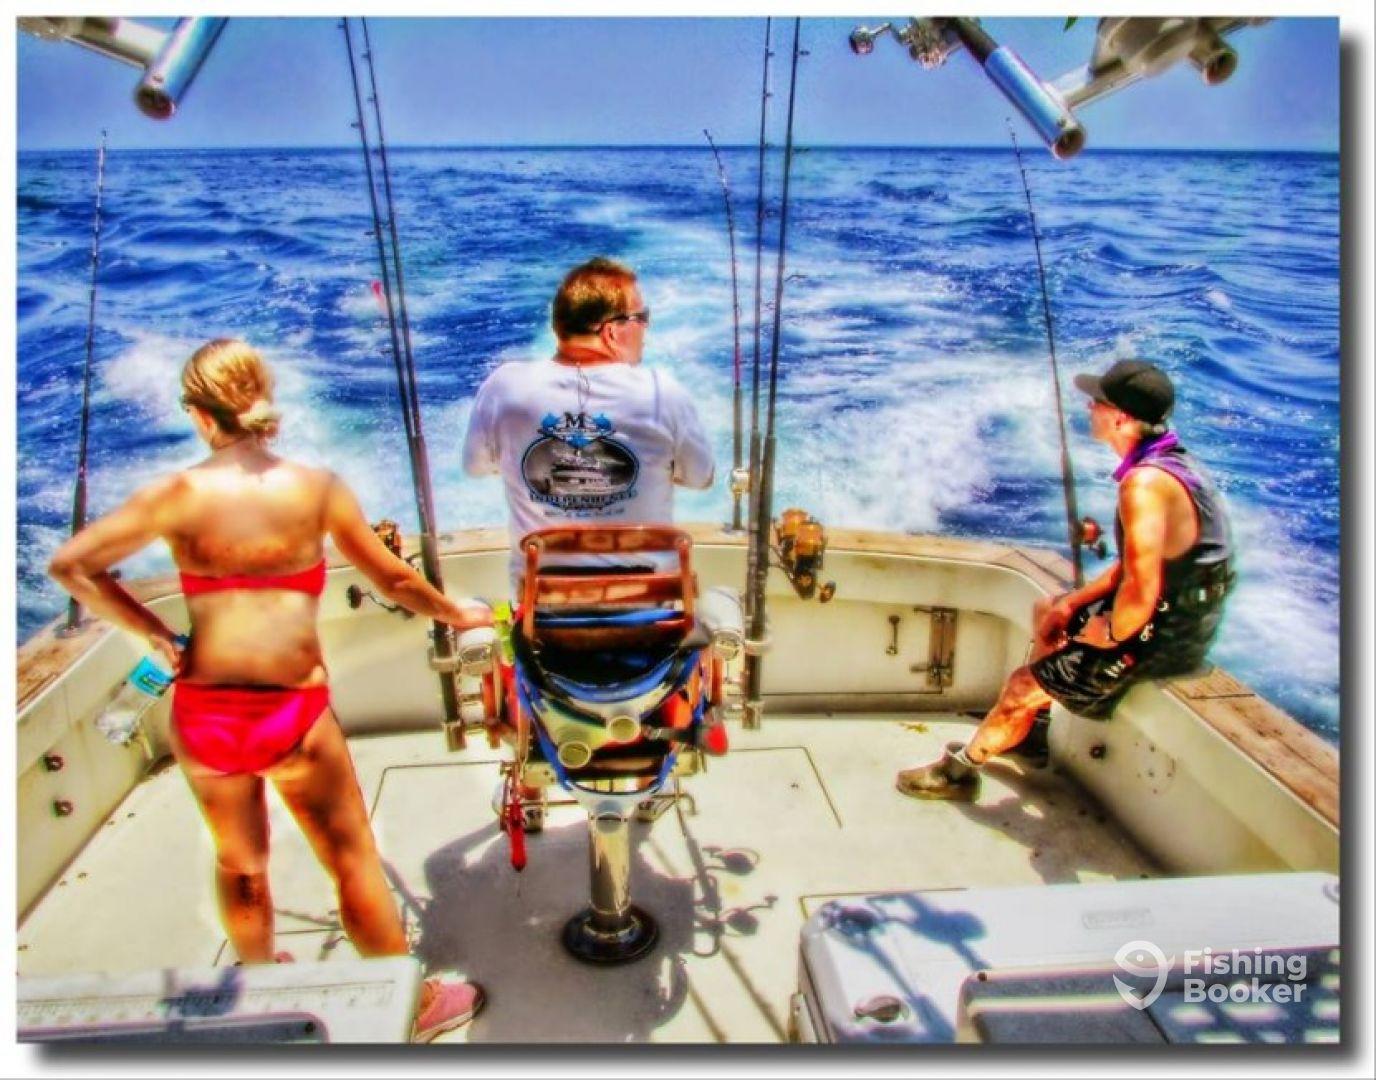 Reward fishing fleet legacy miami fl fishingbooker for Reward fishing fleet